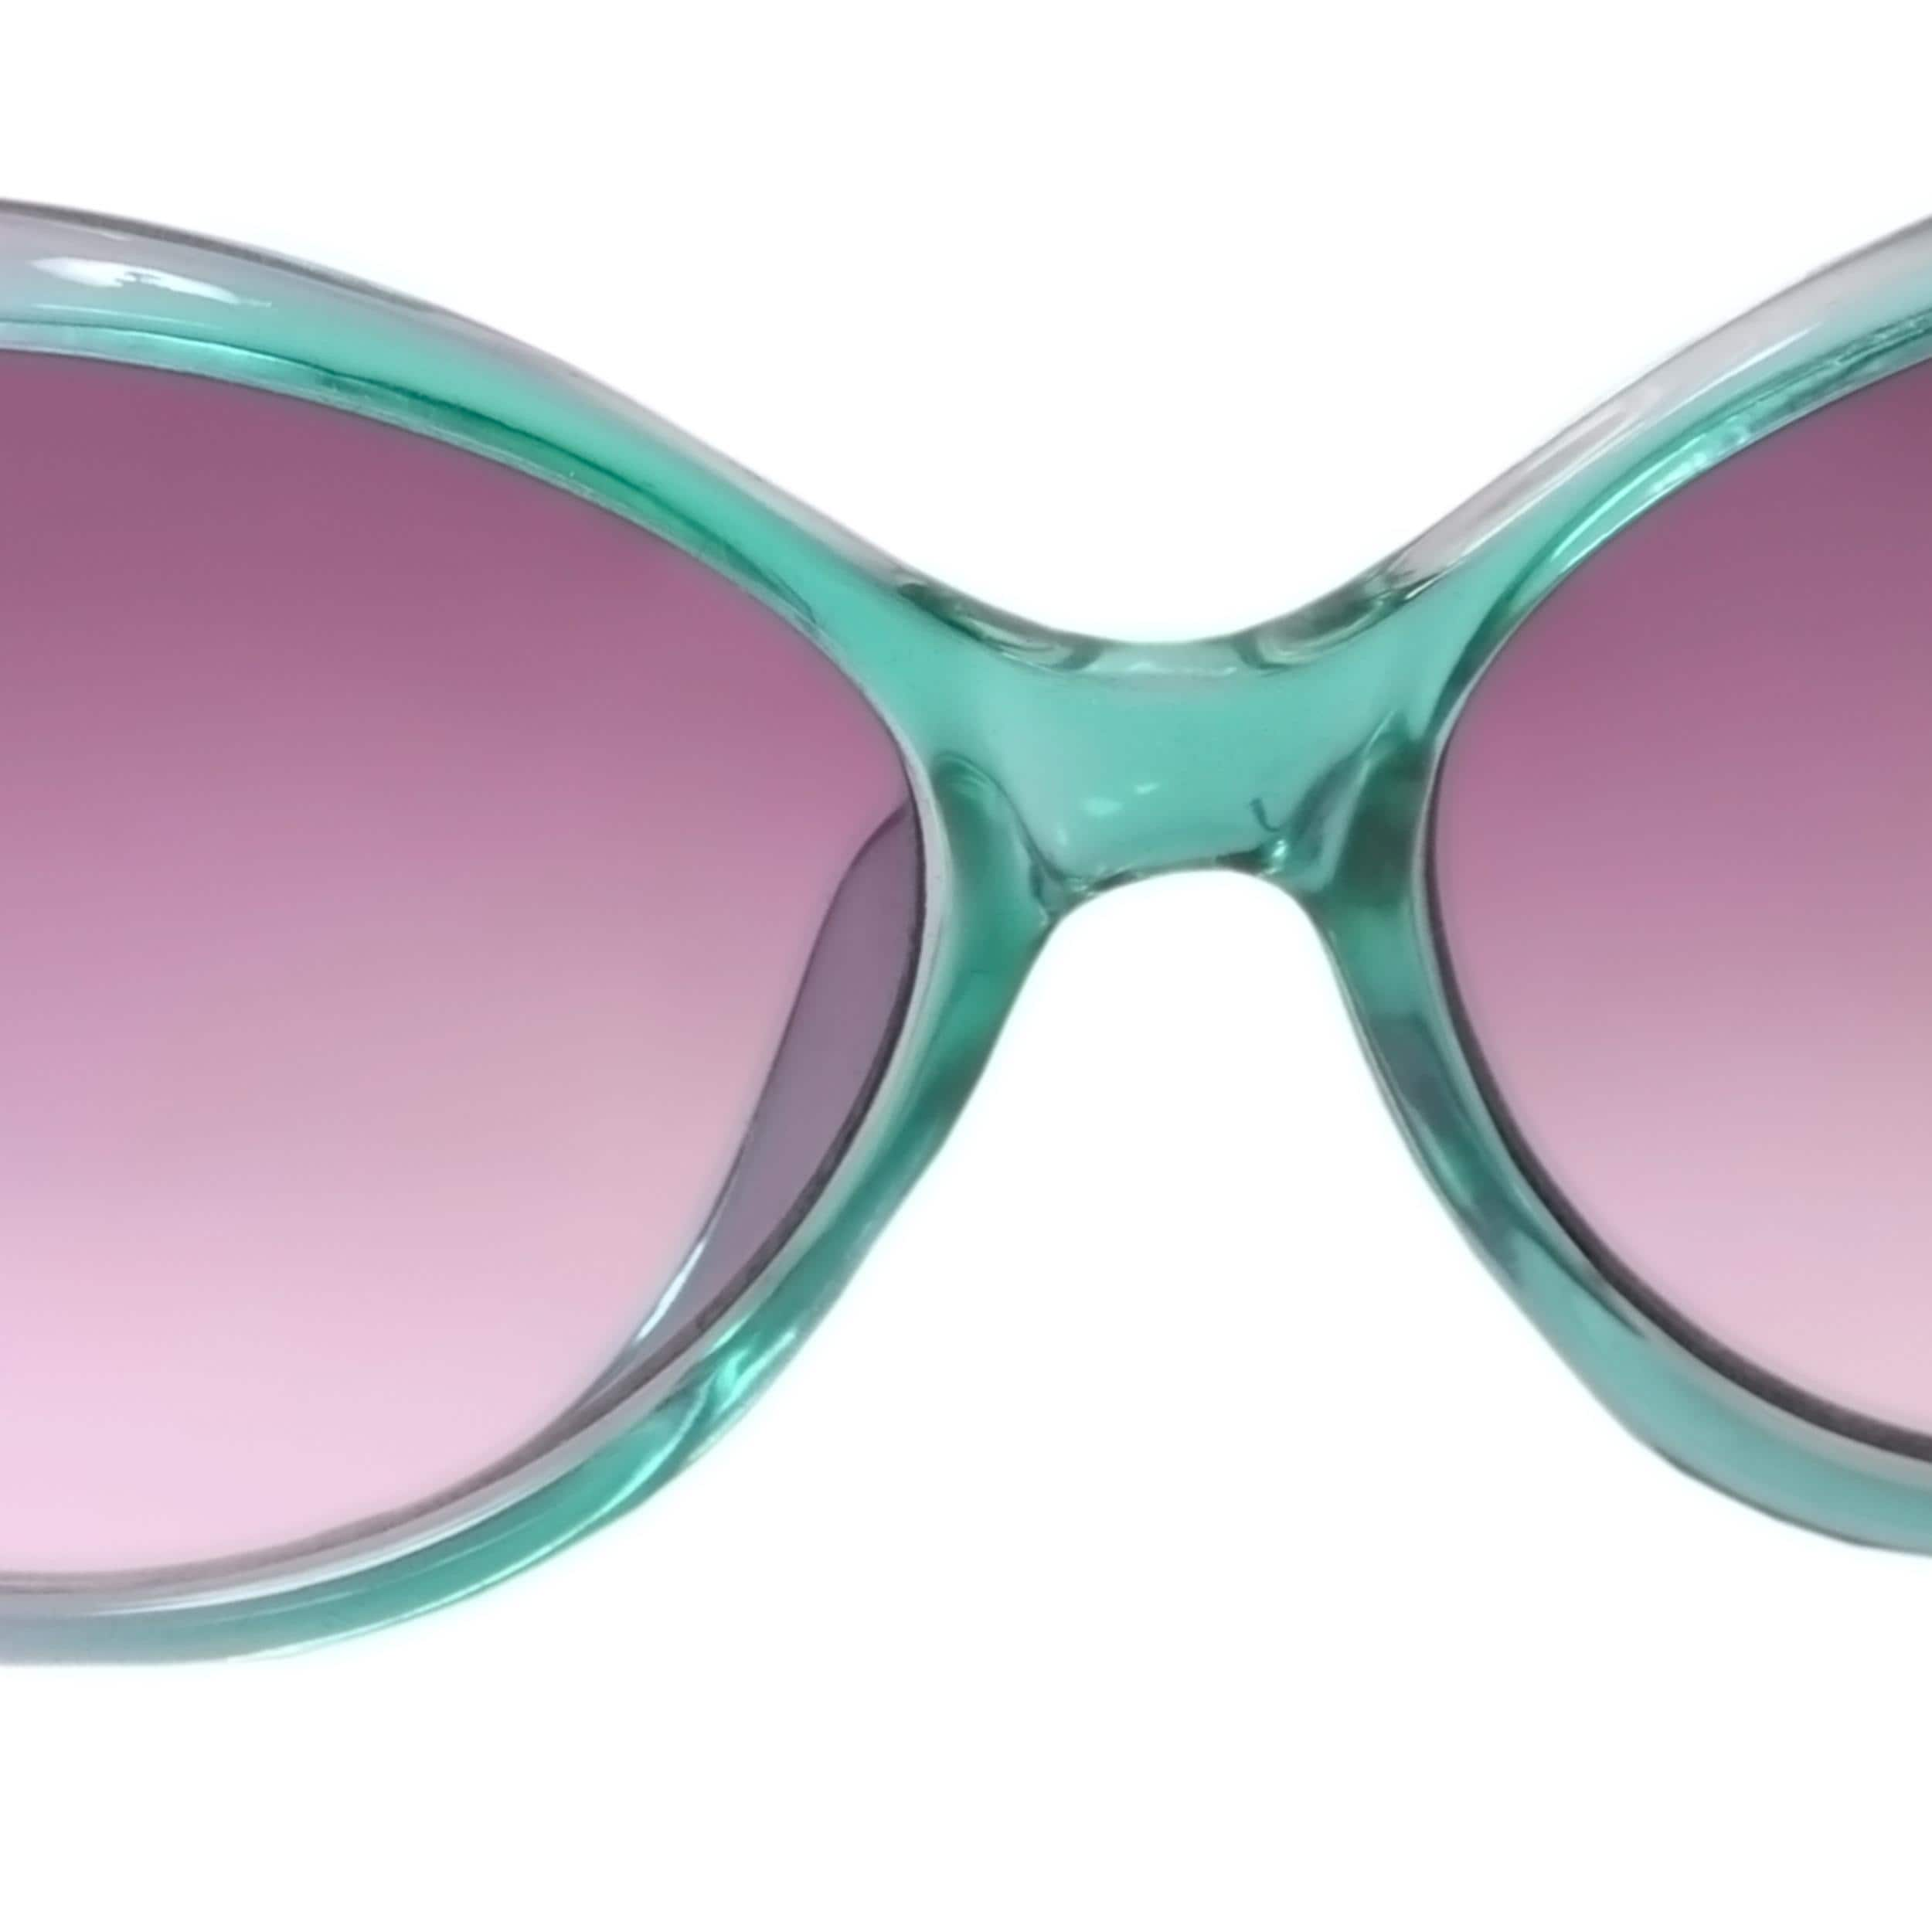 Adi Designs Women's Oversize Heart Detail Fashion Sunglasses - Thumbnail 2